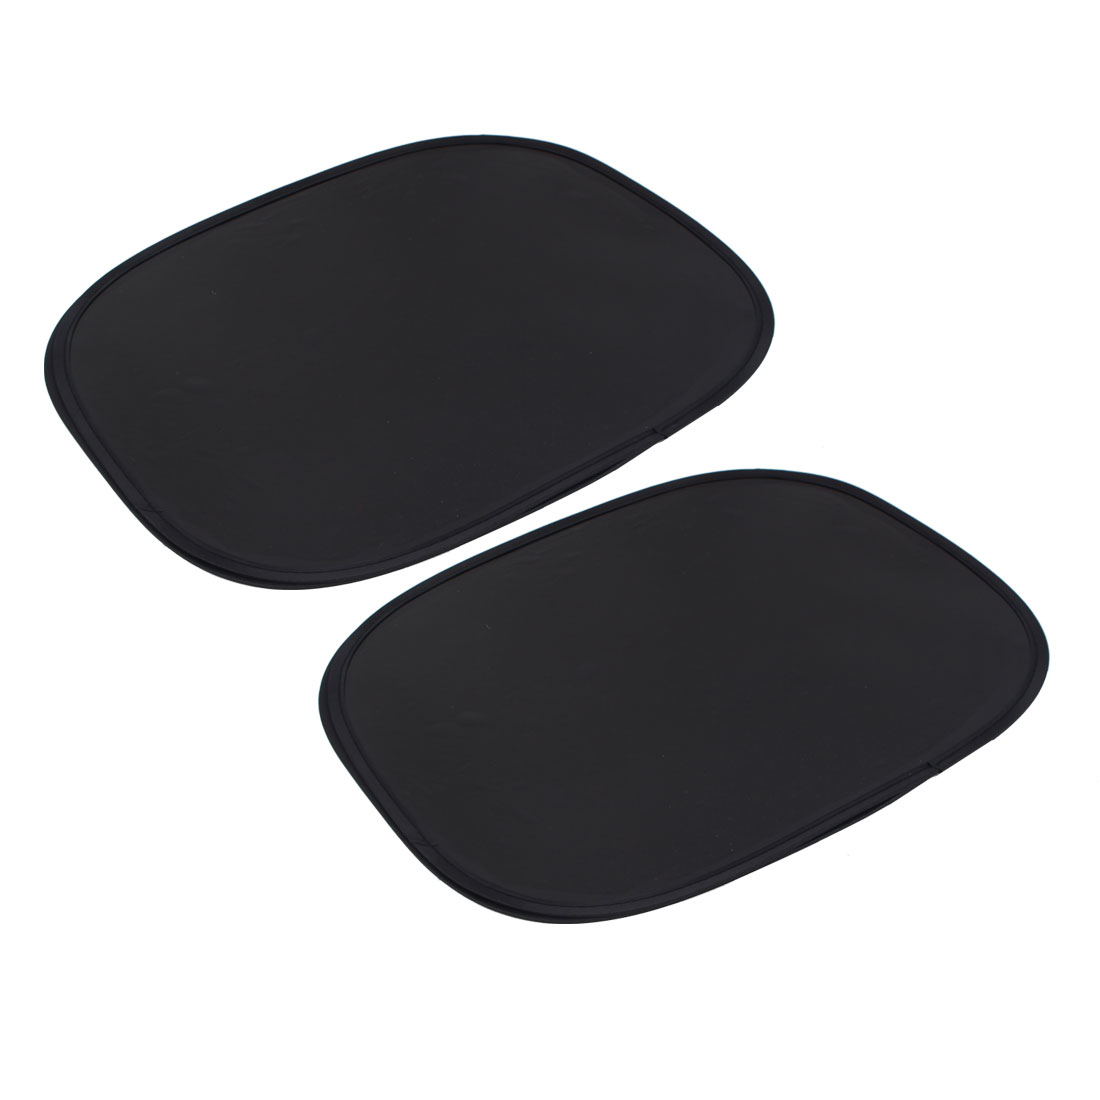 2 Pcs Black 42cm x 36cm PVC Film Side Window Sunshade for Car Vehicles